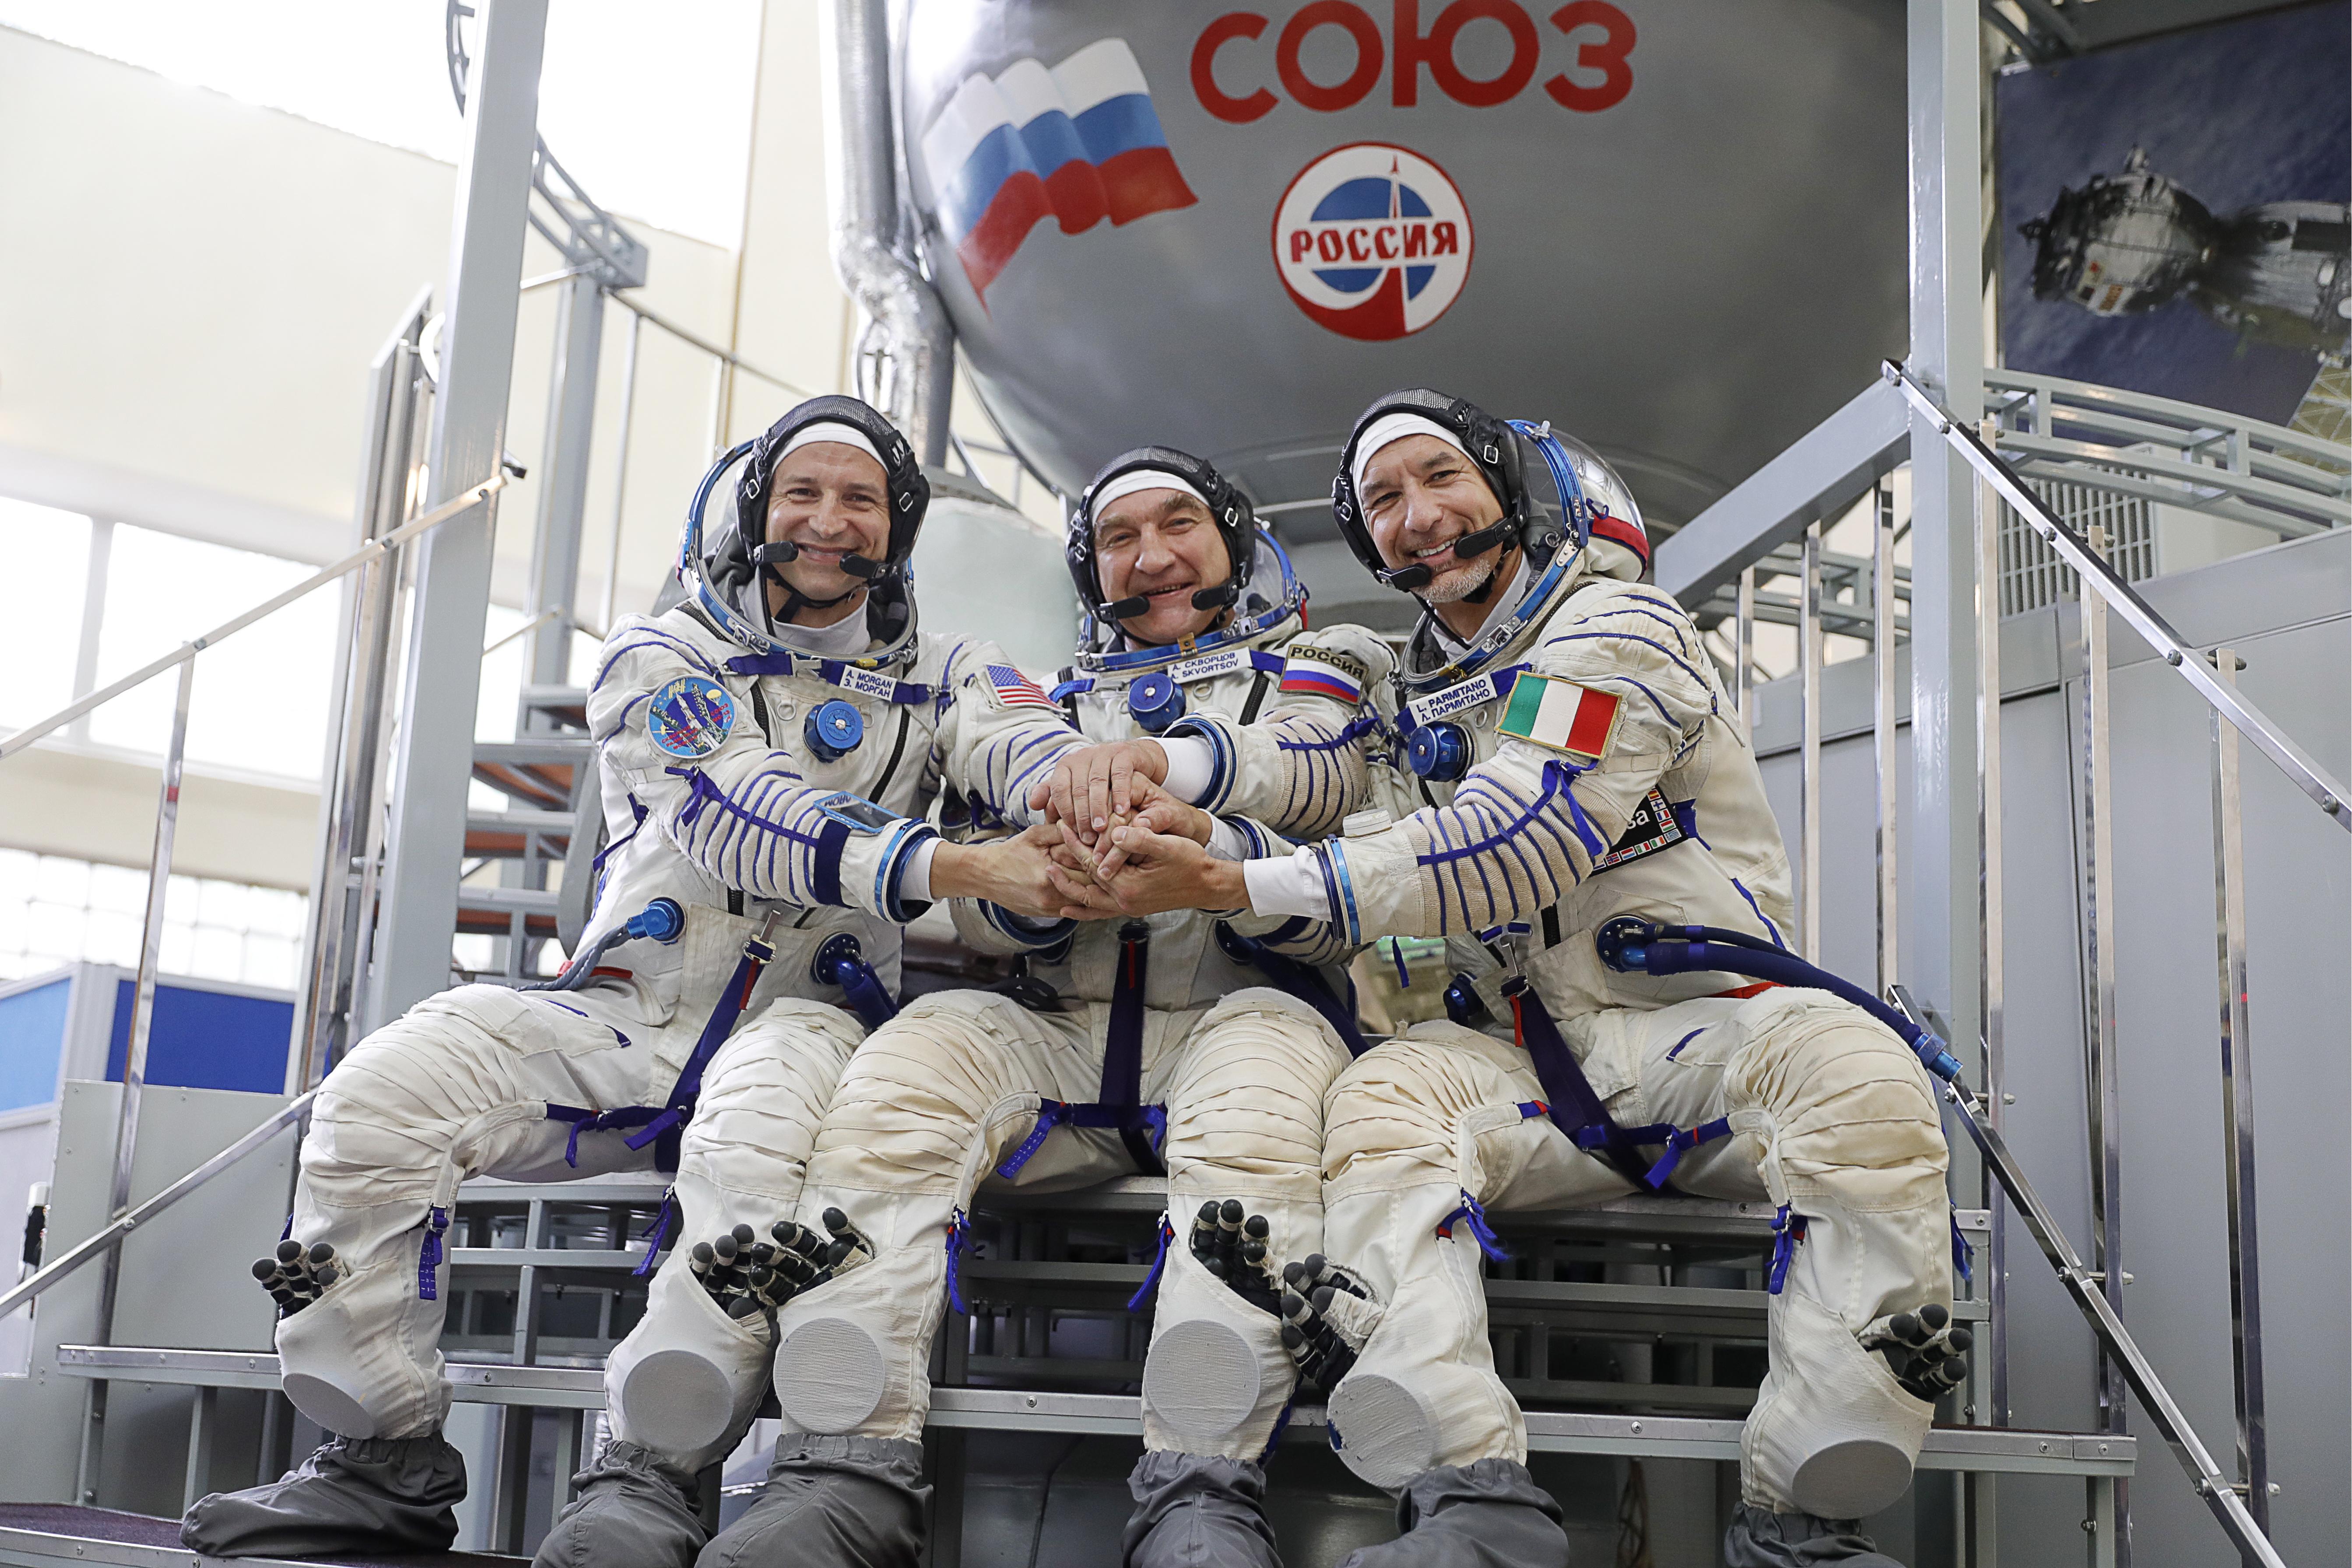 NASA astronaut Andrew R Morgan, Roscosmos cosmonaut Alexander Skvortsov and ESA astronaut Luca Parmitano (L-R) attend a qualification training session for the upcoming mission to the International Space Station, at Yuri Gagarin Cosmonaut Training Centre in Zvyozdny Gorodok on Jun. 27, 2019.